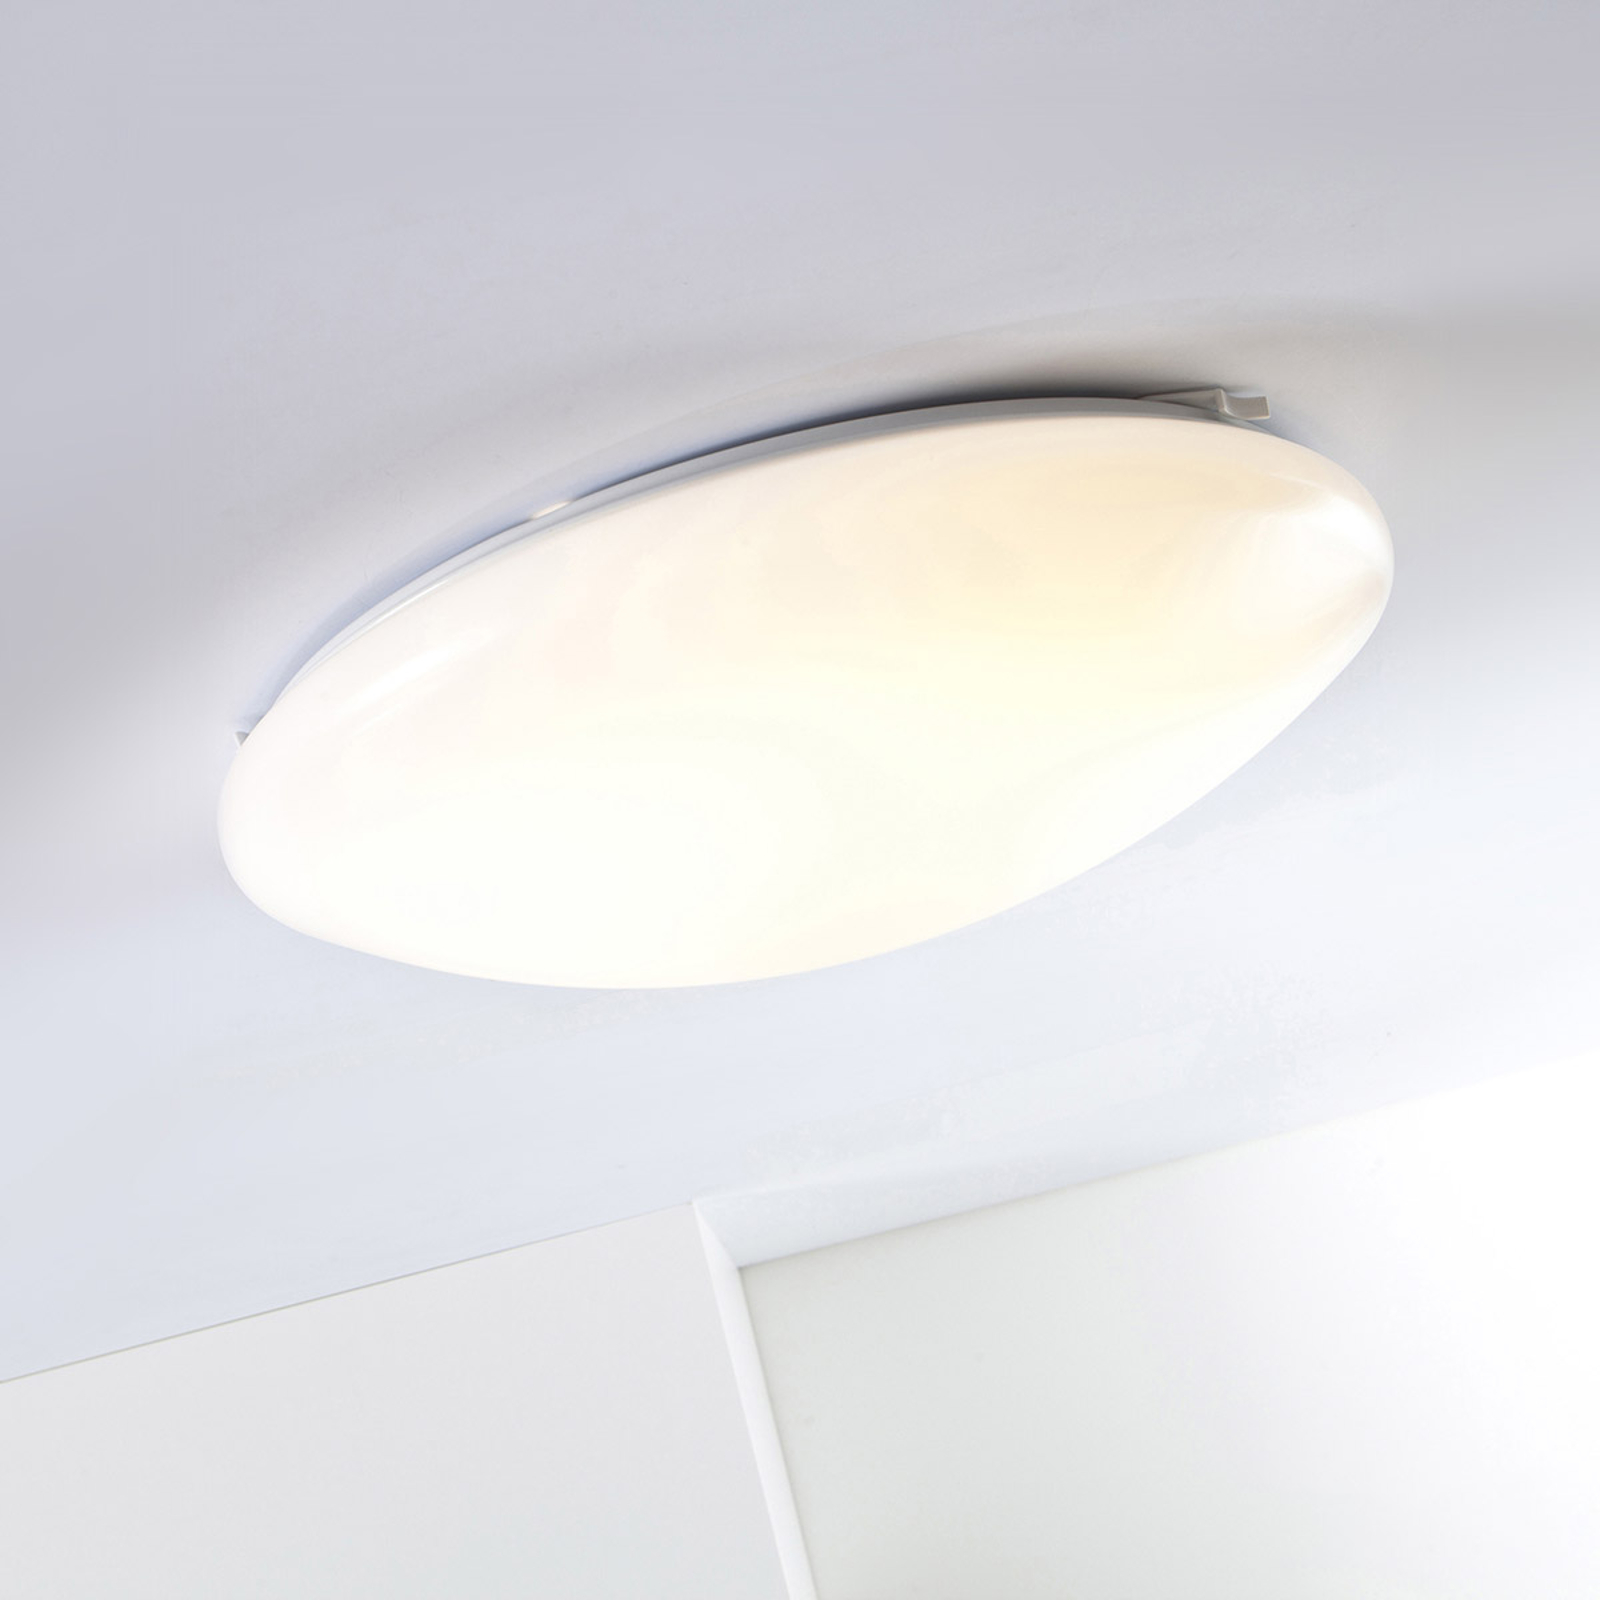 Plafonnier LED Basic rond de AEG, 14W